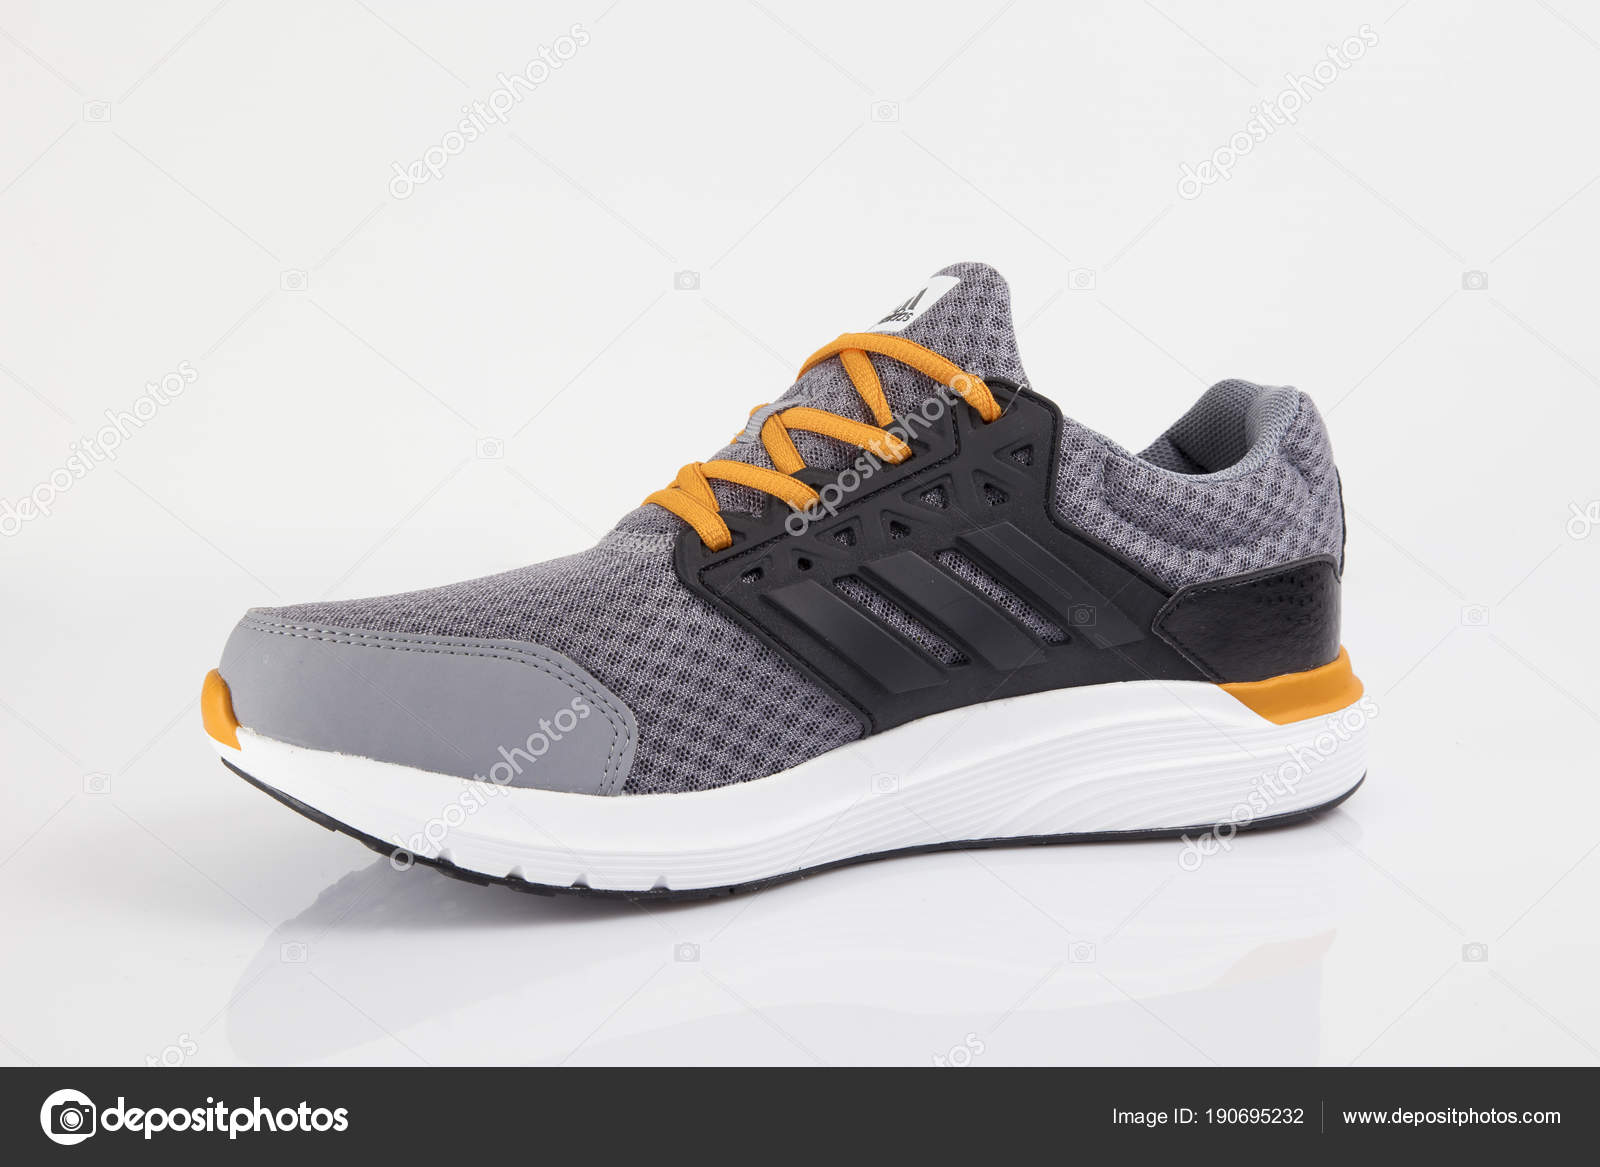 März Adidas Schuhe Portugal Afife Running 2018 kiOTZPXu